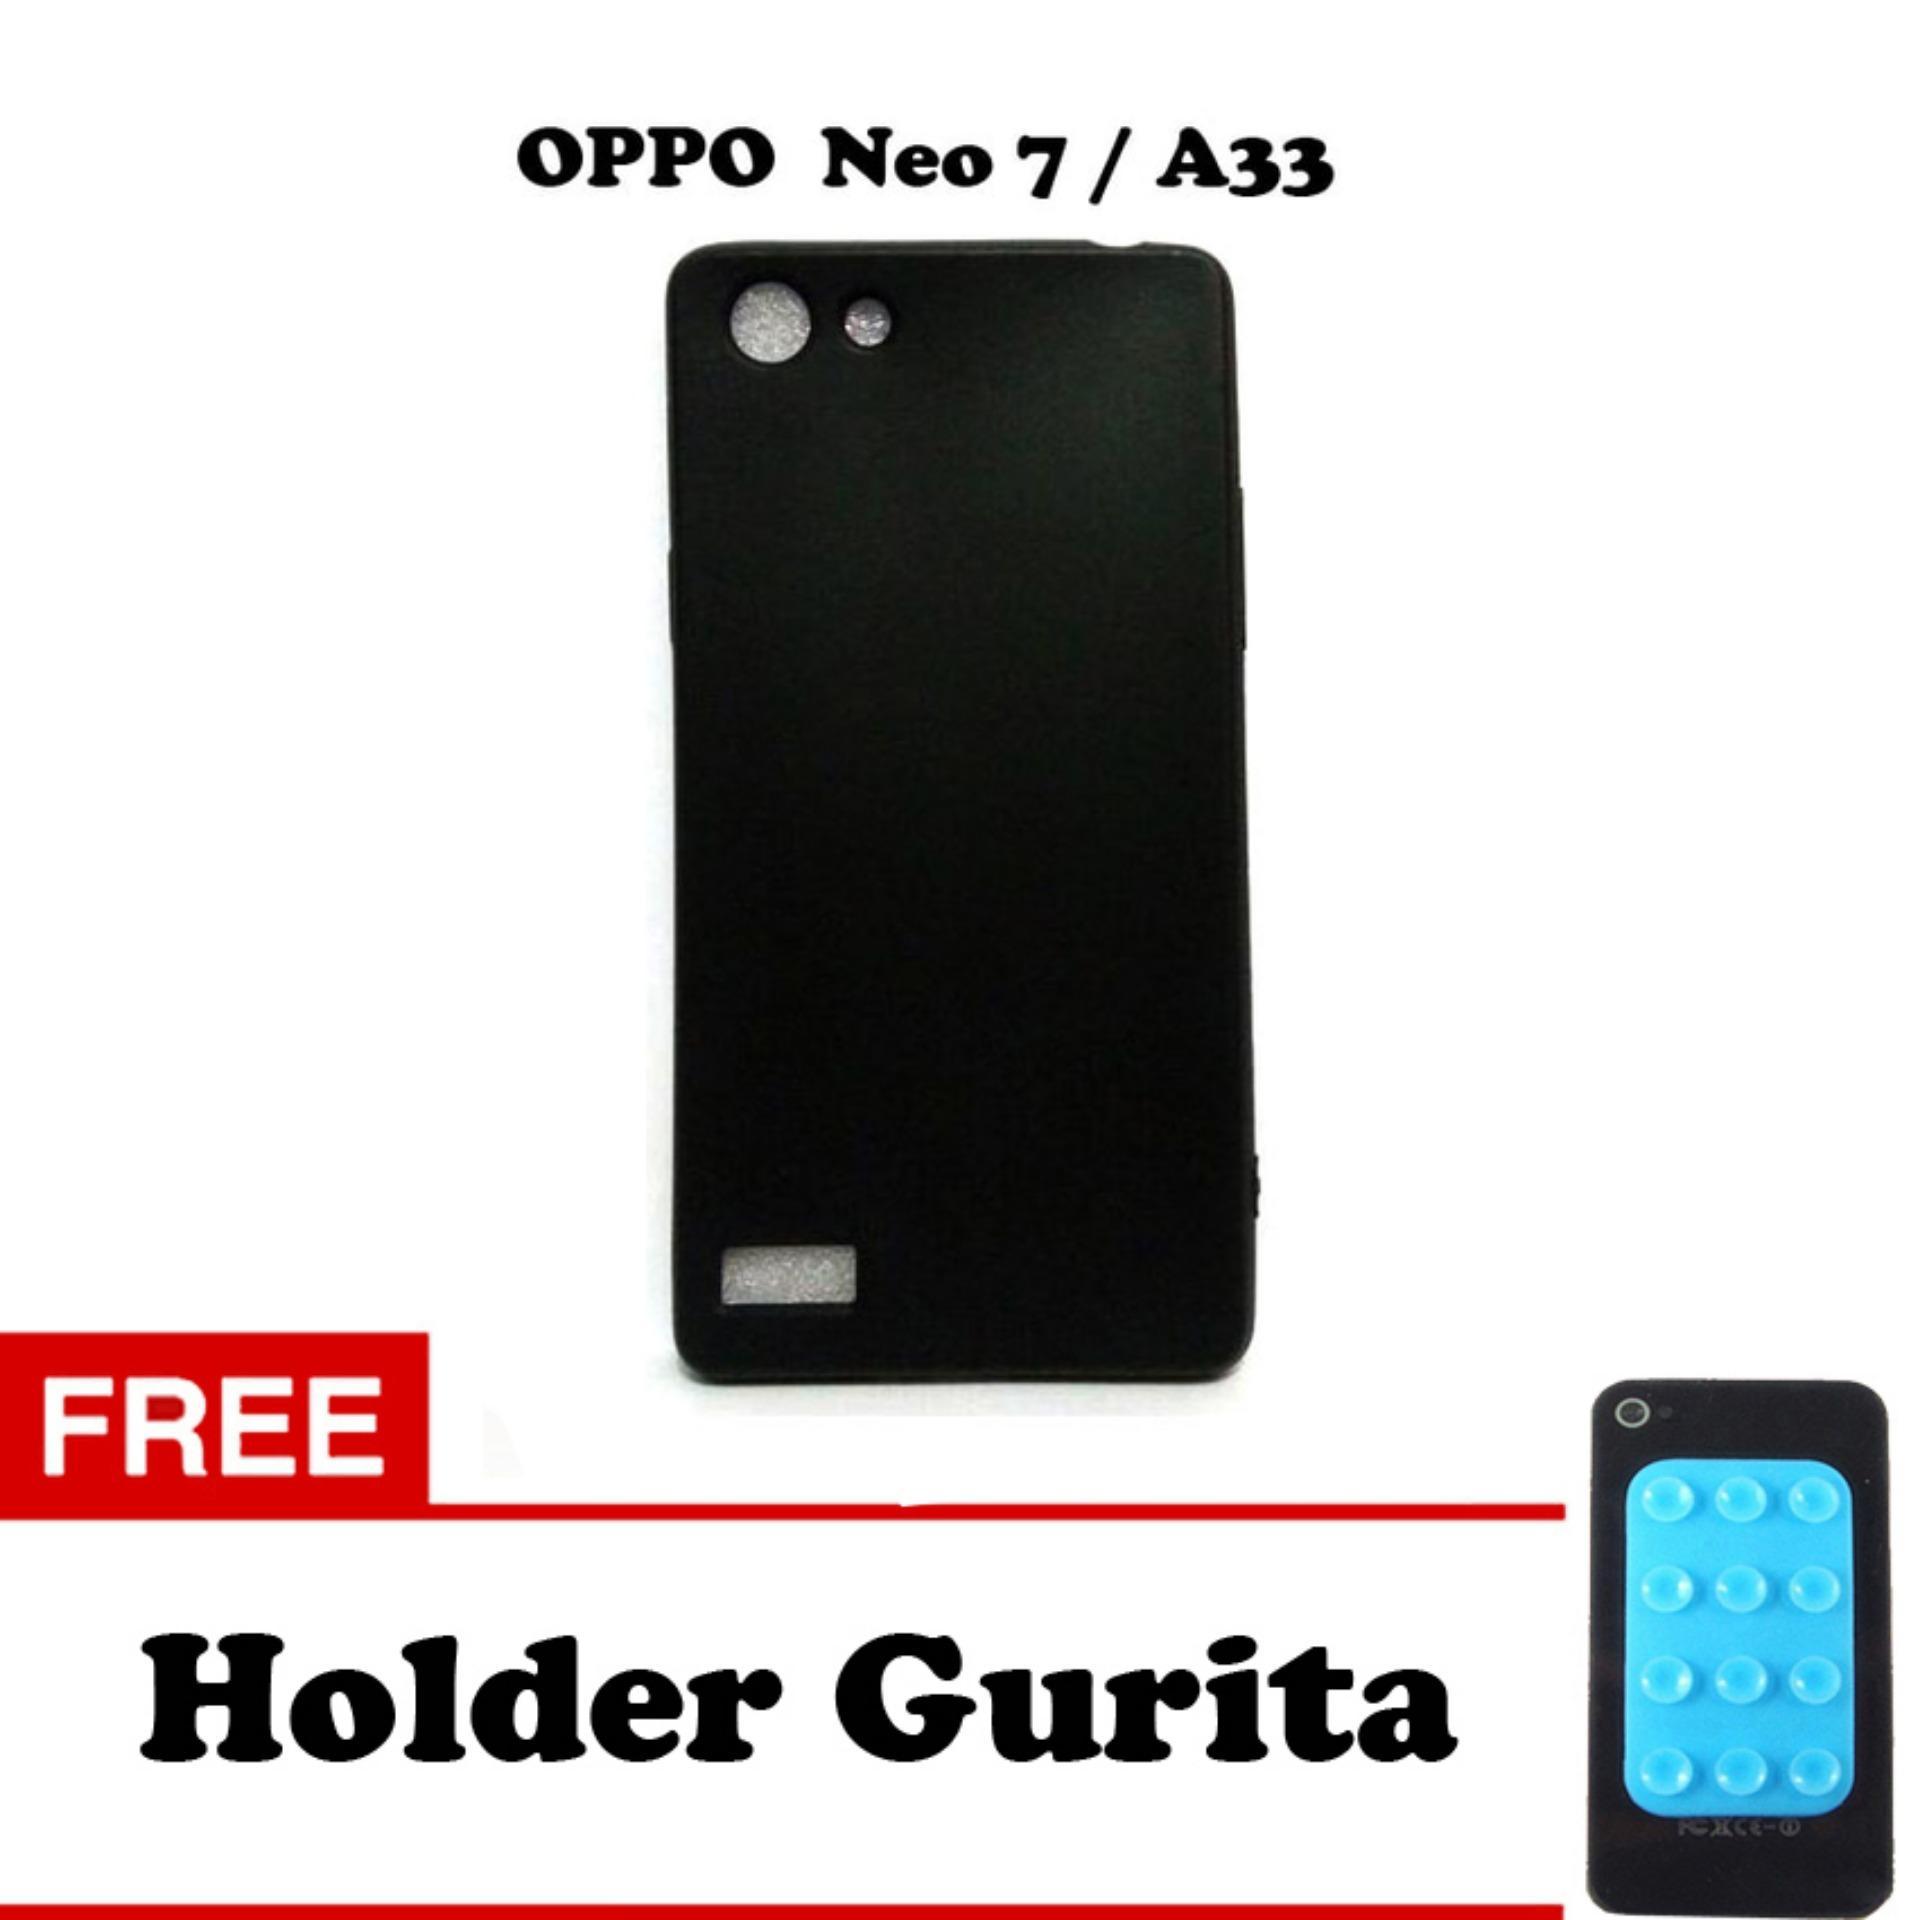 Case Slim Black Matte Oppo Neo 7 / A33 Softcase Baby Skin + Free Holder Gurita